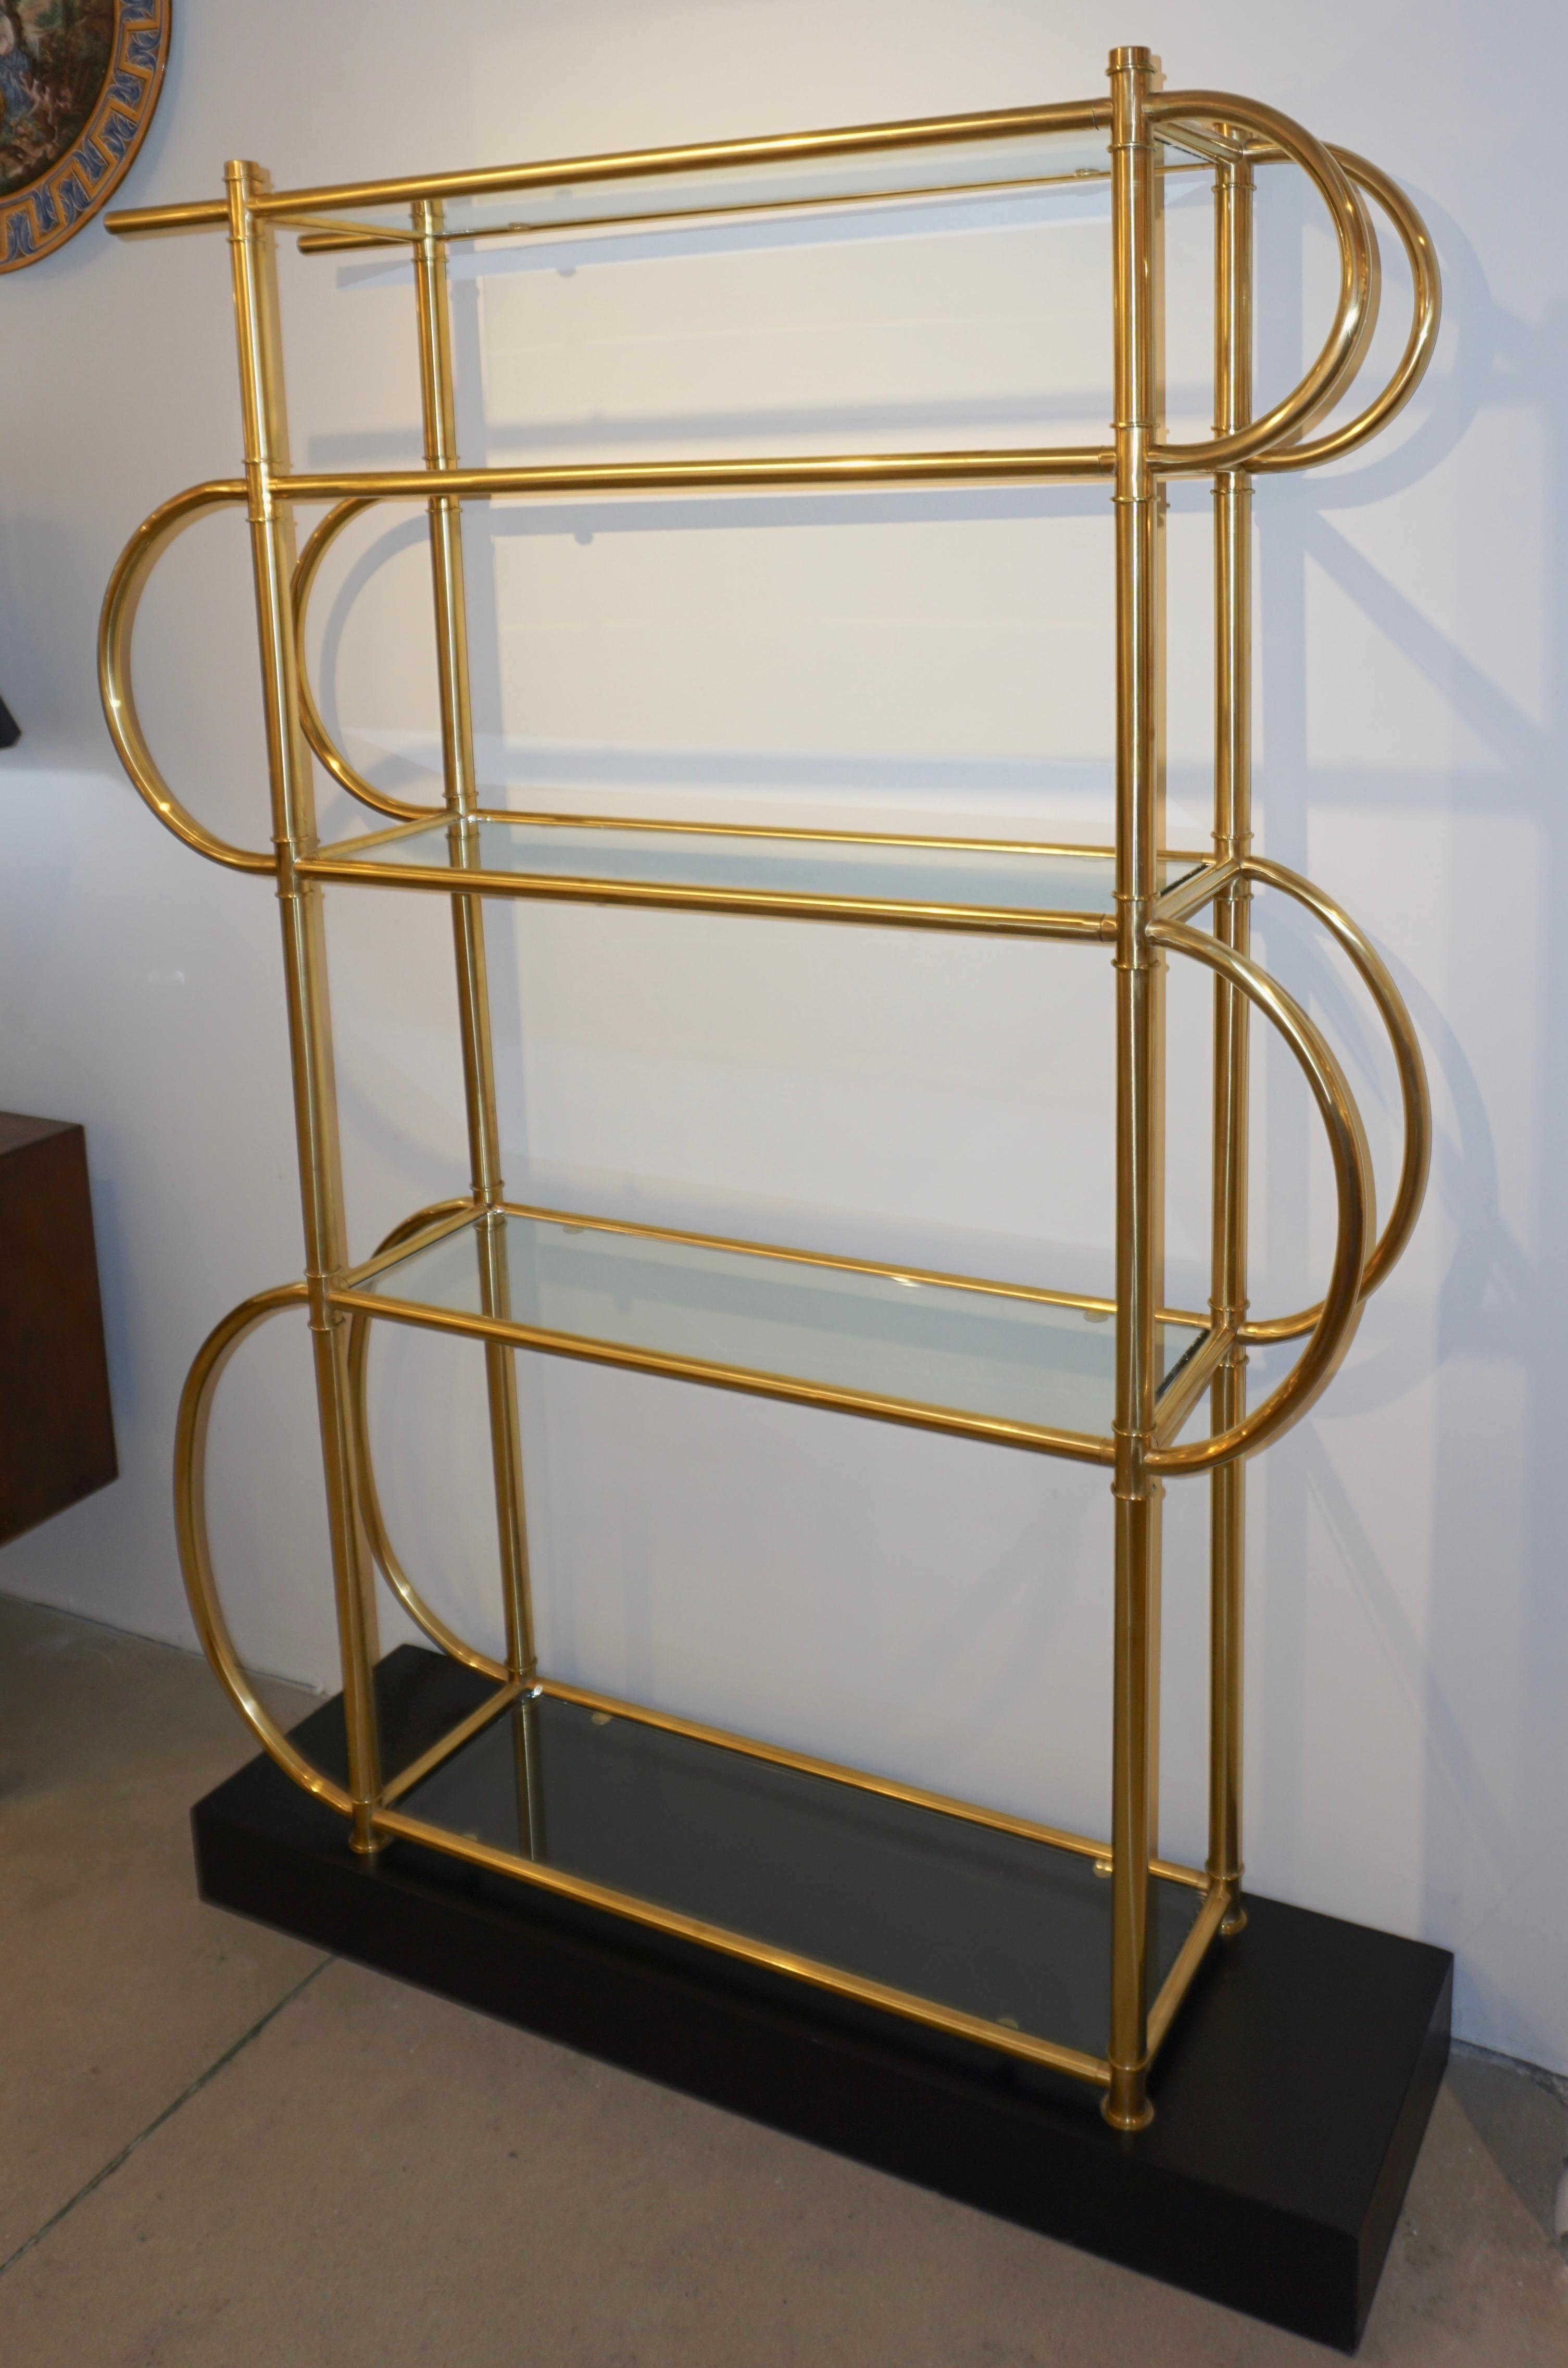 Italian Modern Gold Brass Tubular Shelving Unit Etagere On Black Lacquered Base